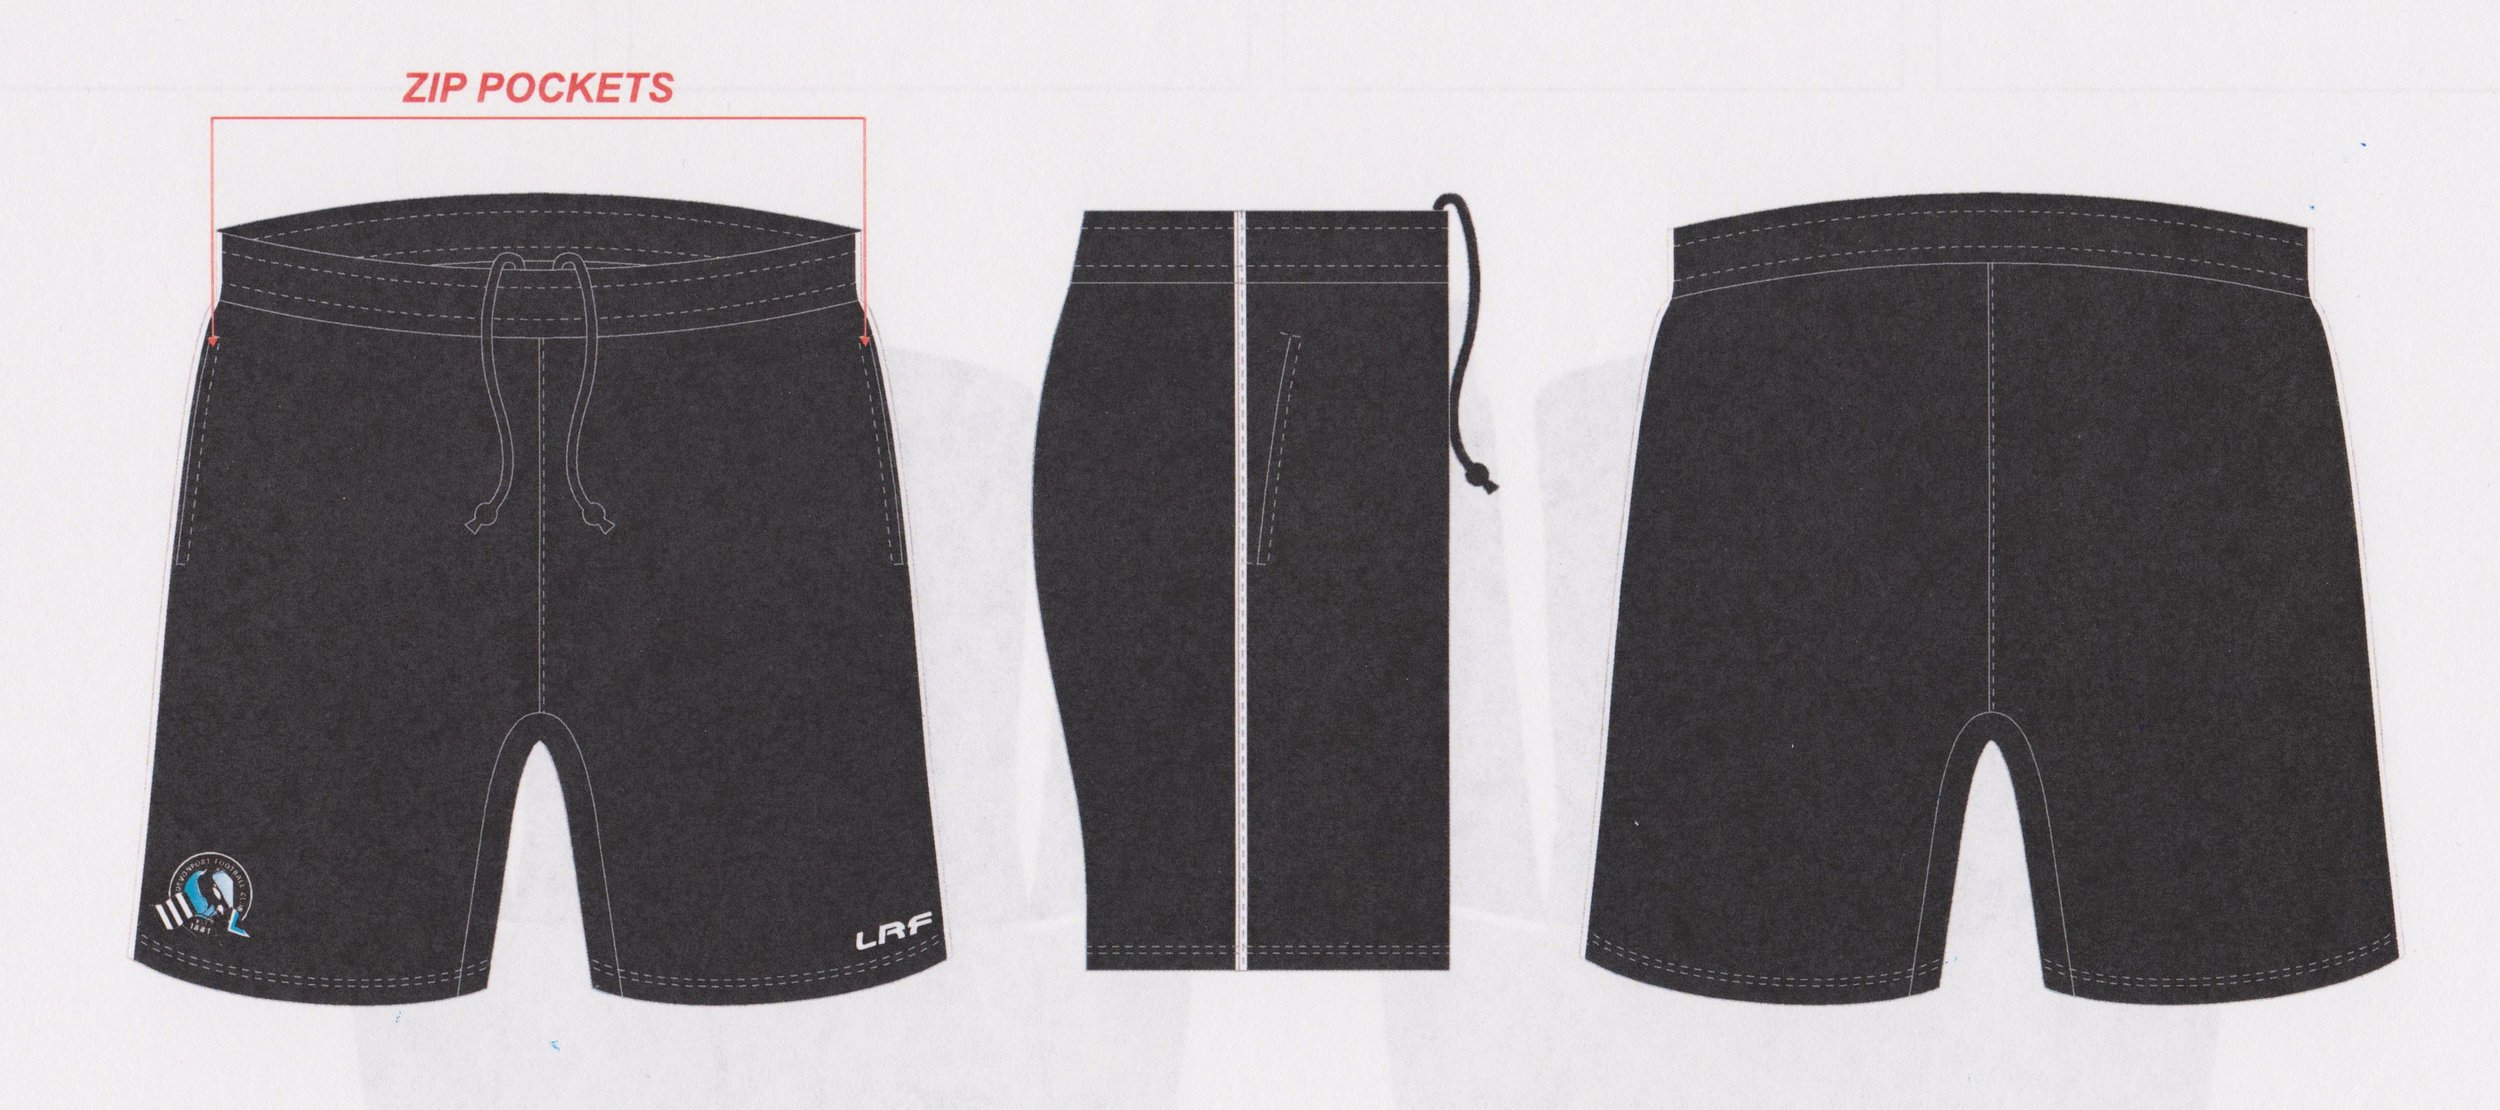 Travel shorts - $40